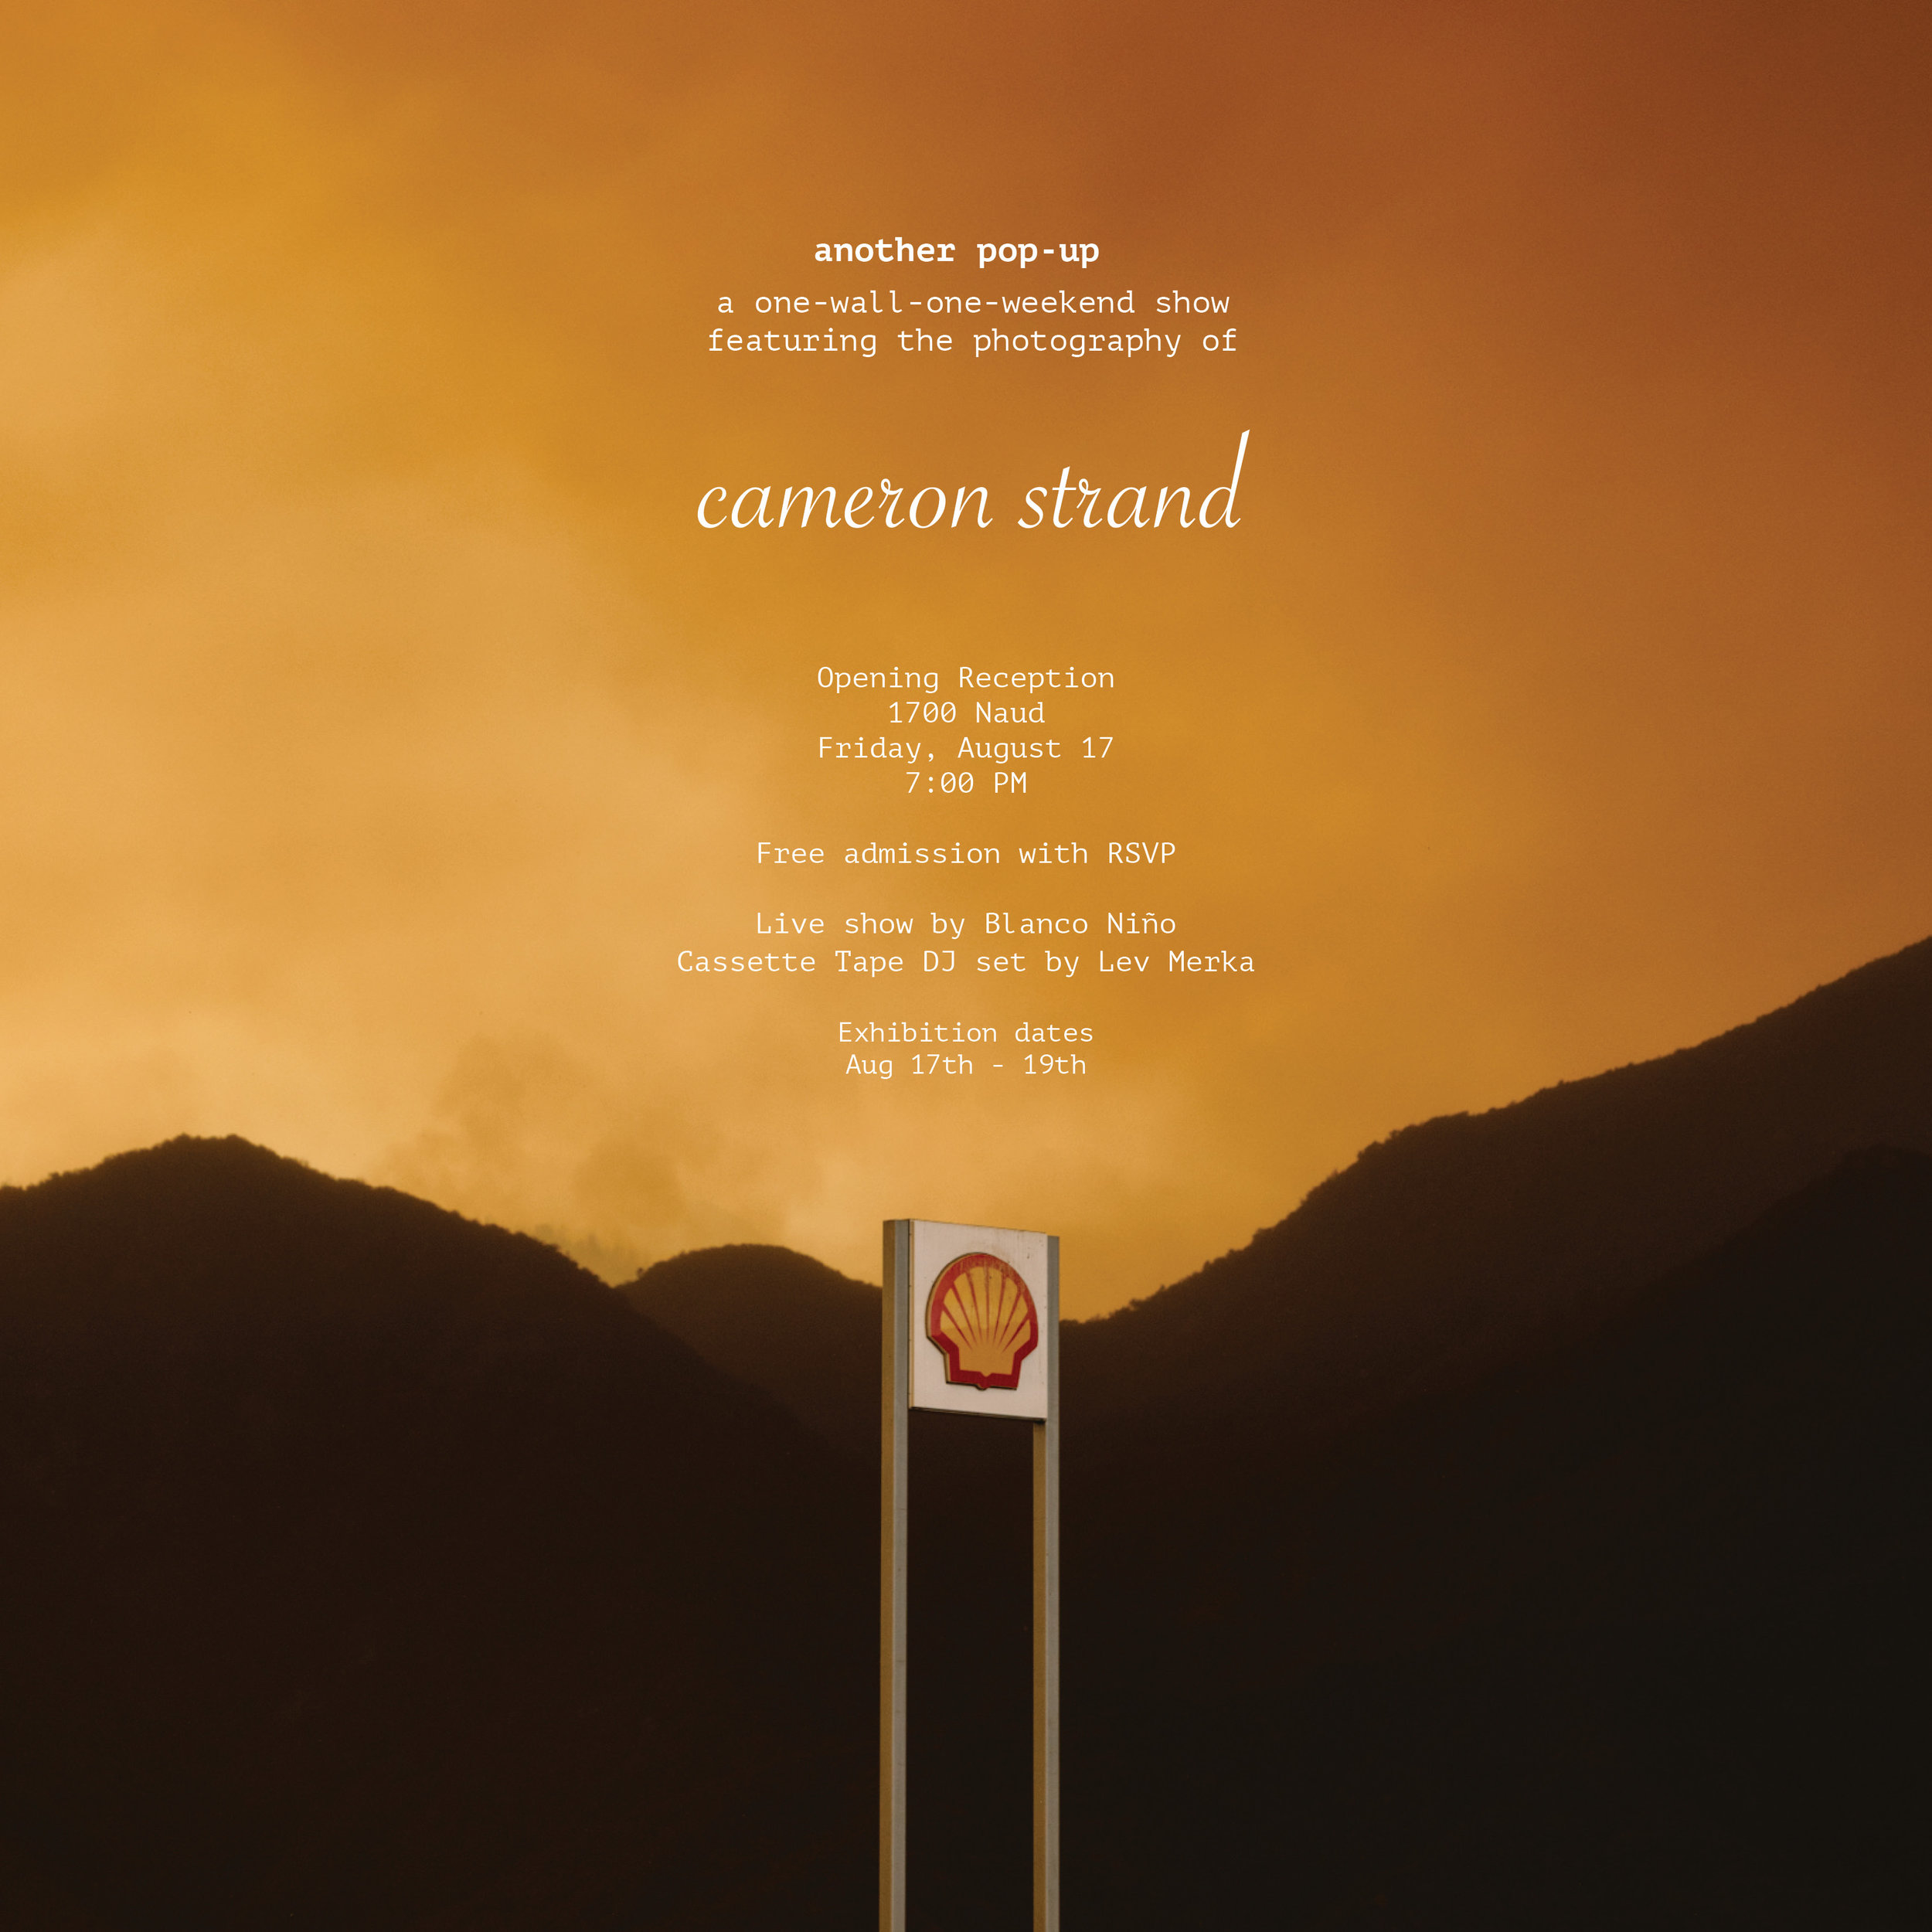 cameron_strand_flyer4.jpg